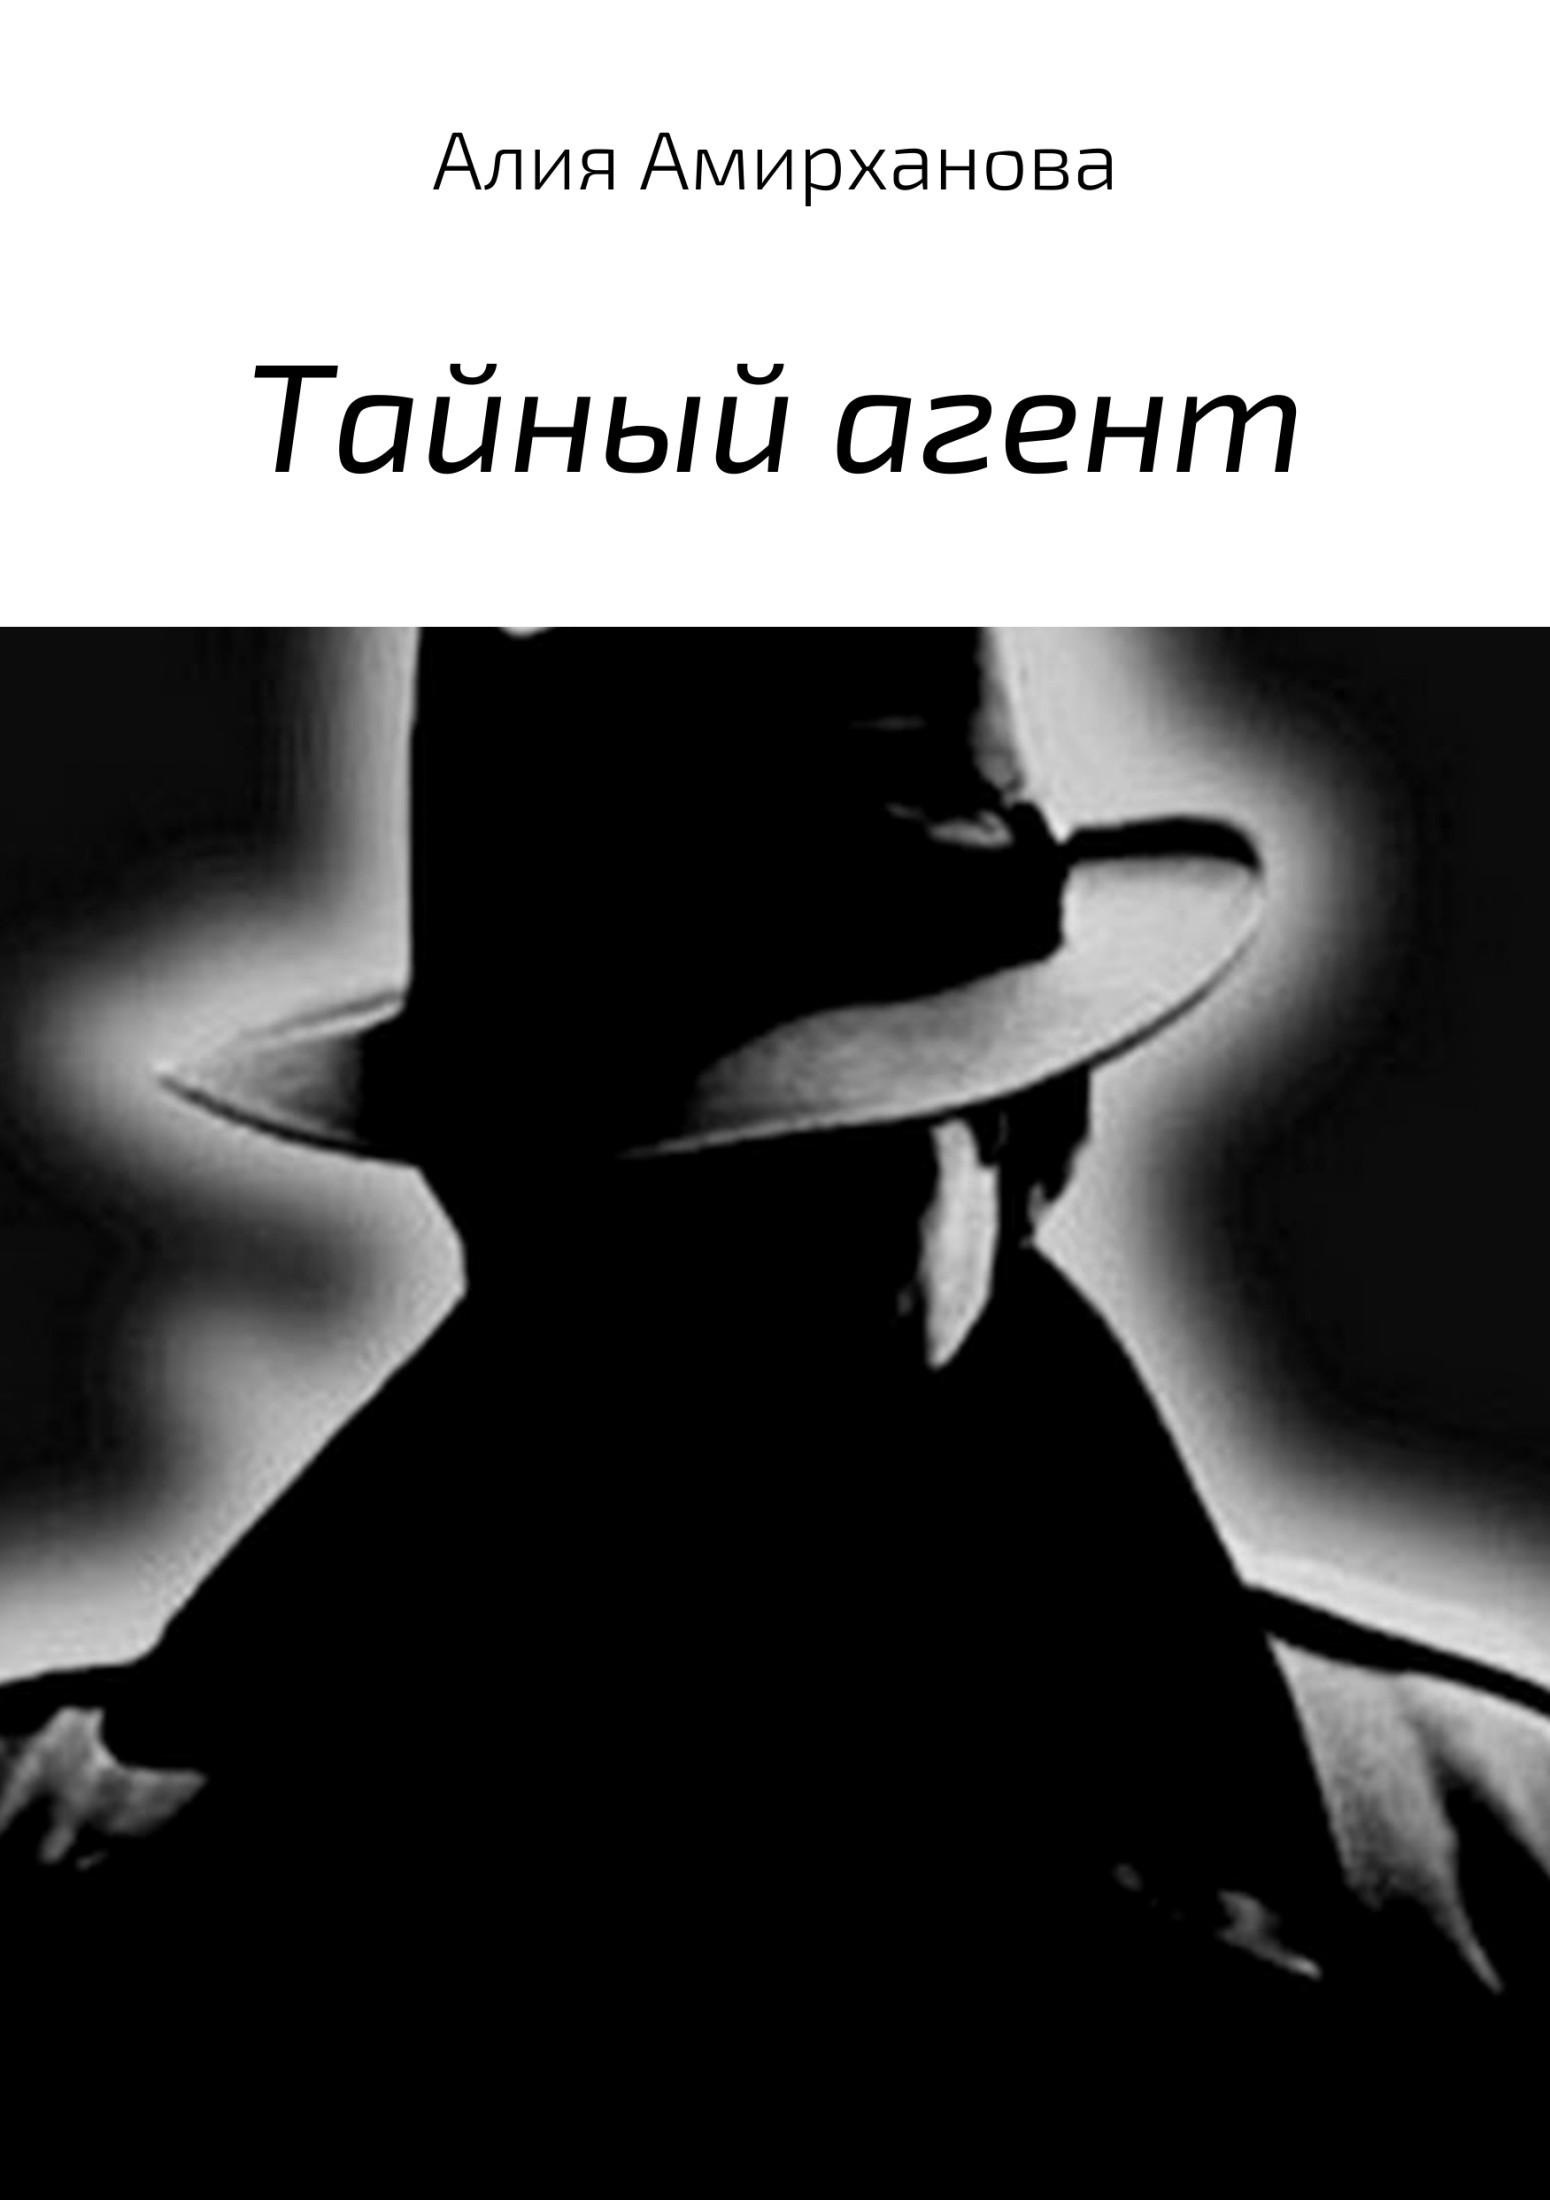 Тайный агент